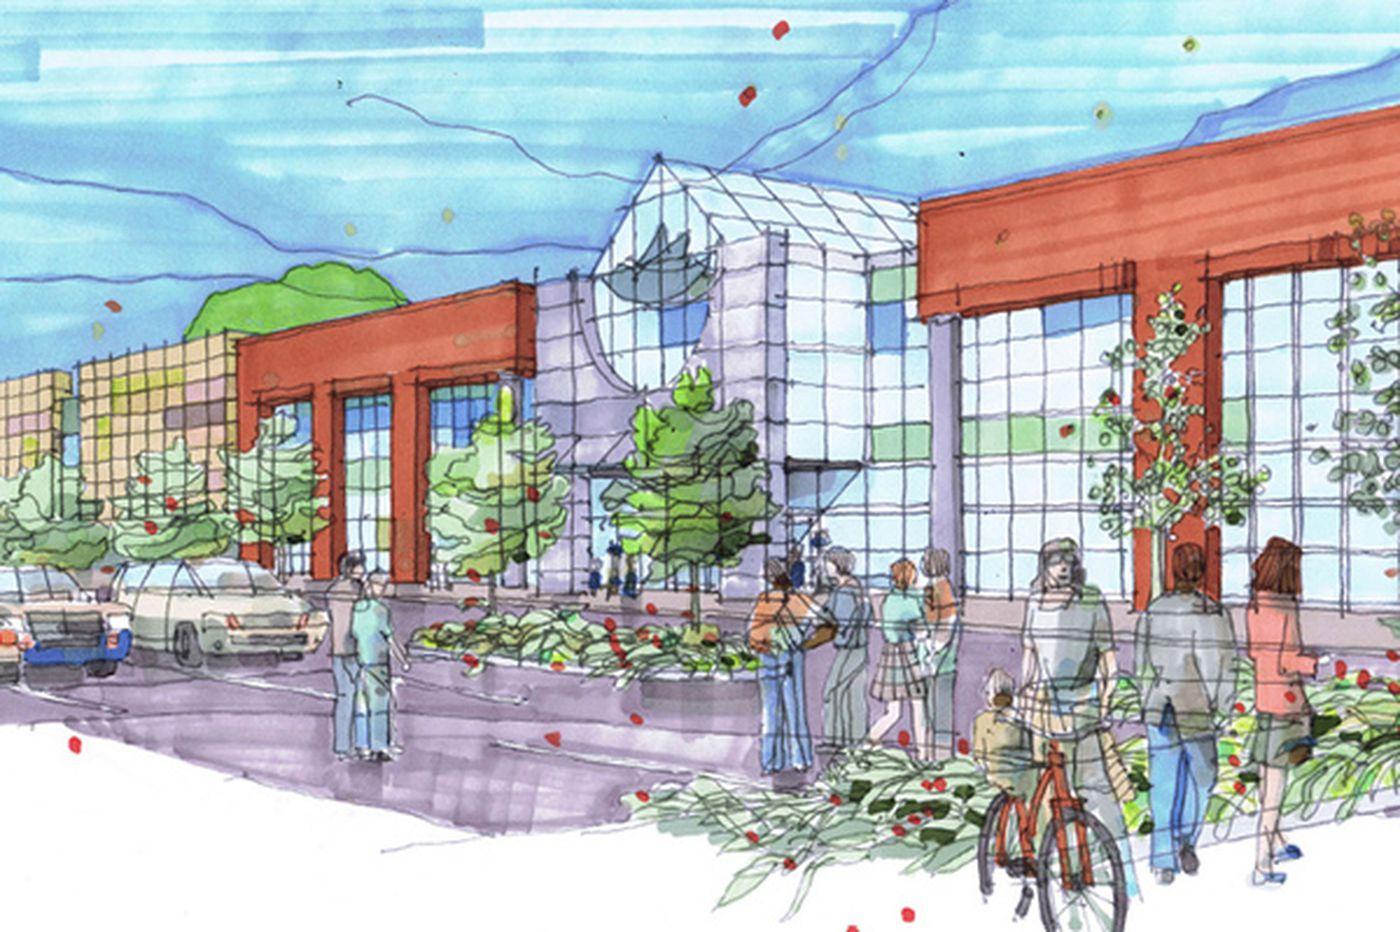 Plans to transform underperforming Burlington mall